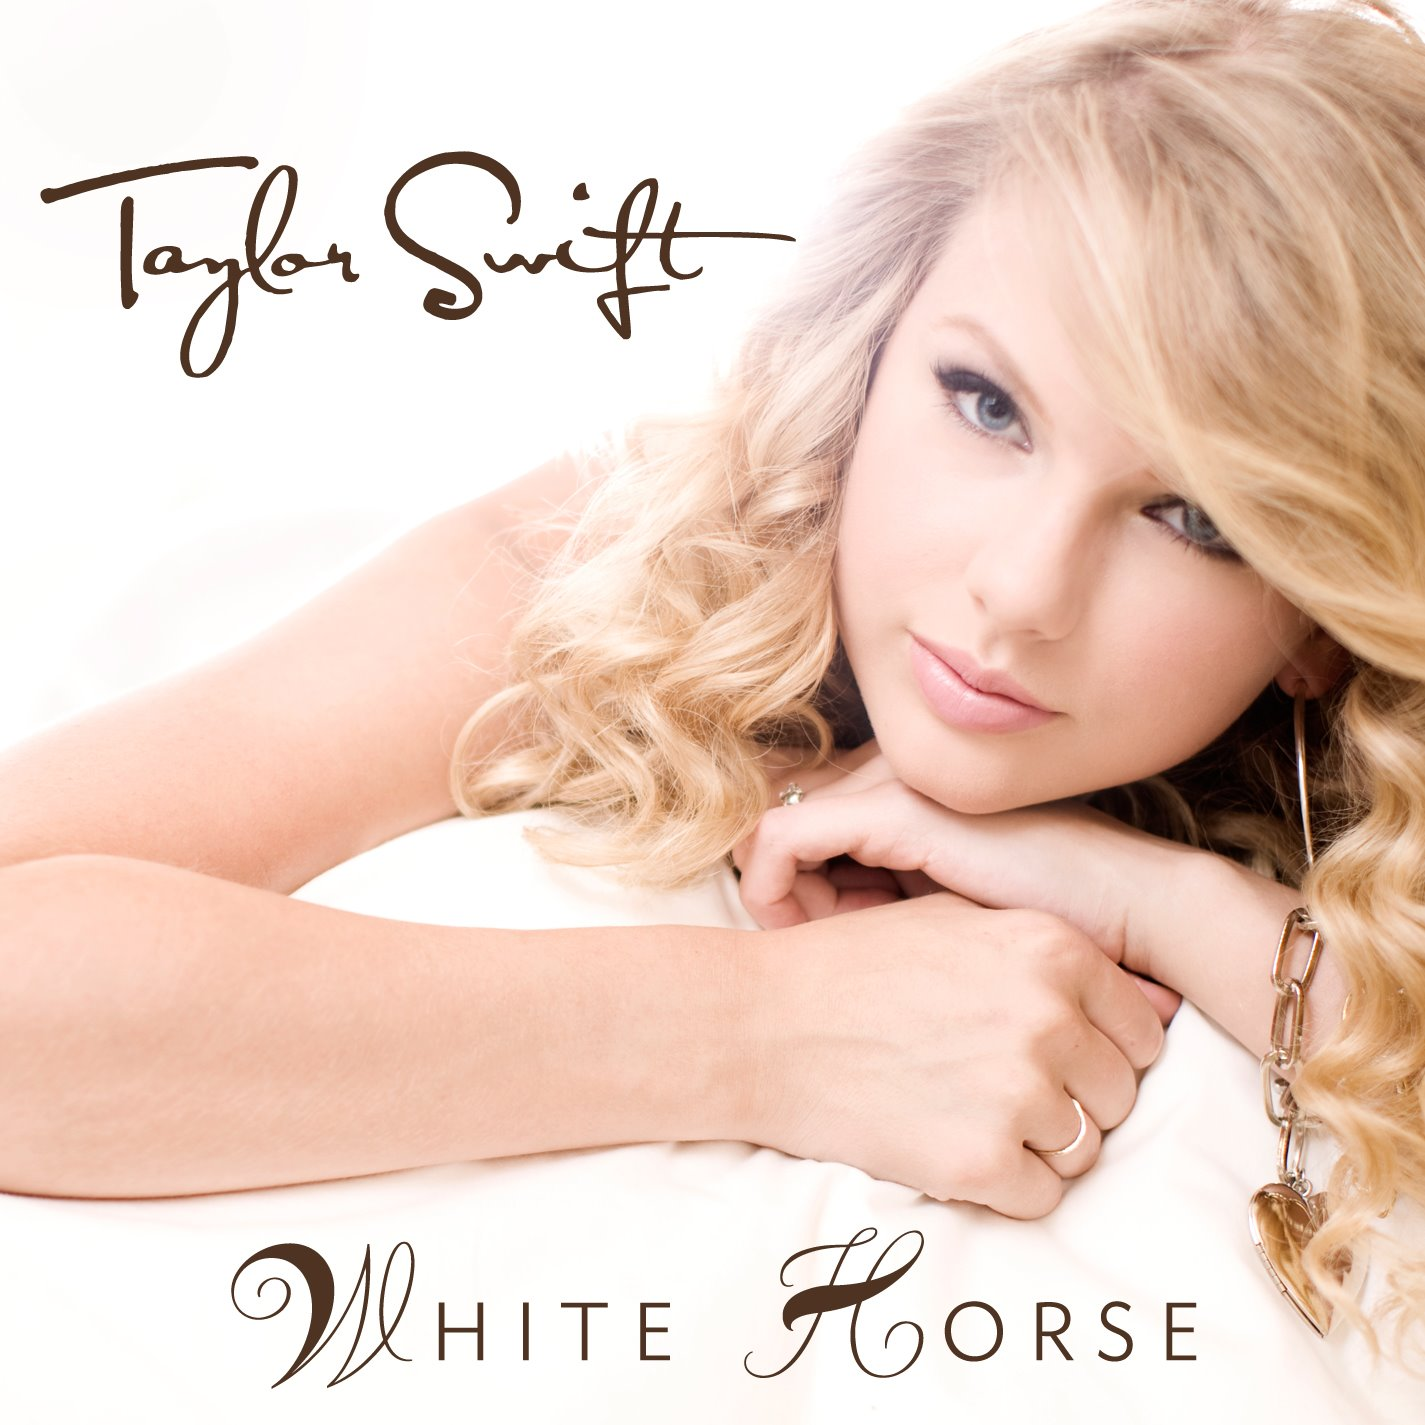 Тейлор свифт песни слушать онлайн